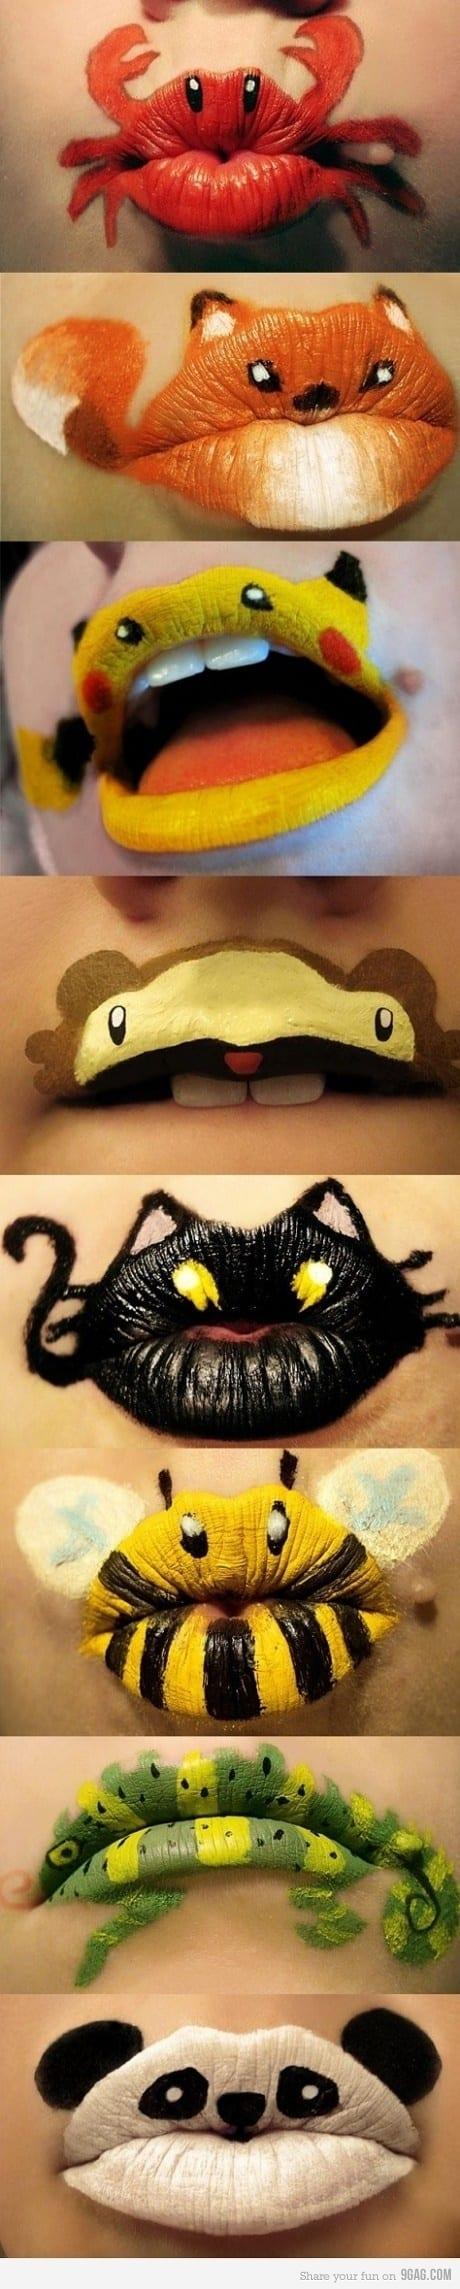 27 Spooky Halloween Lip Makeup Ideas Designbump